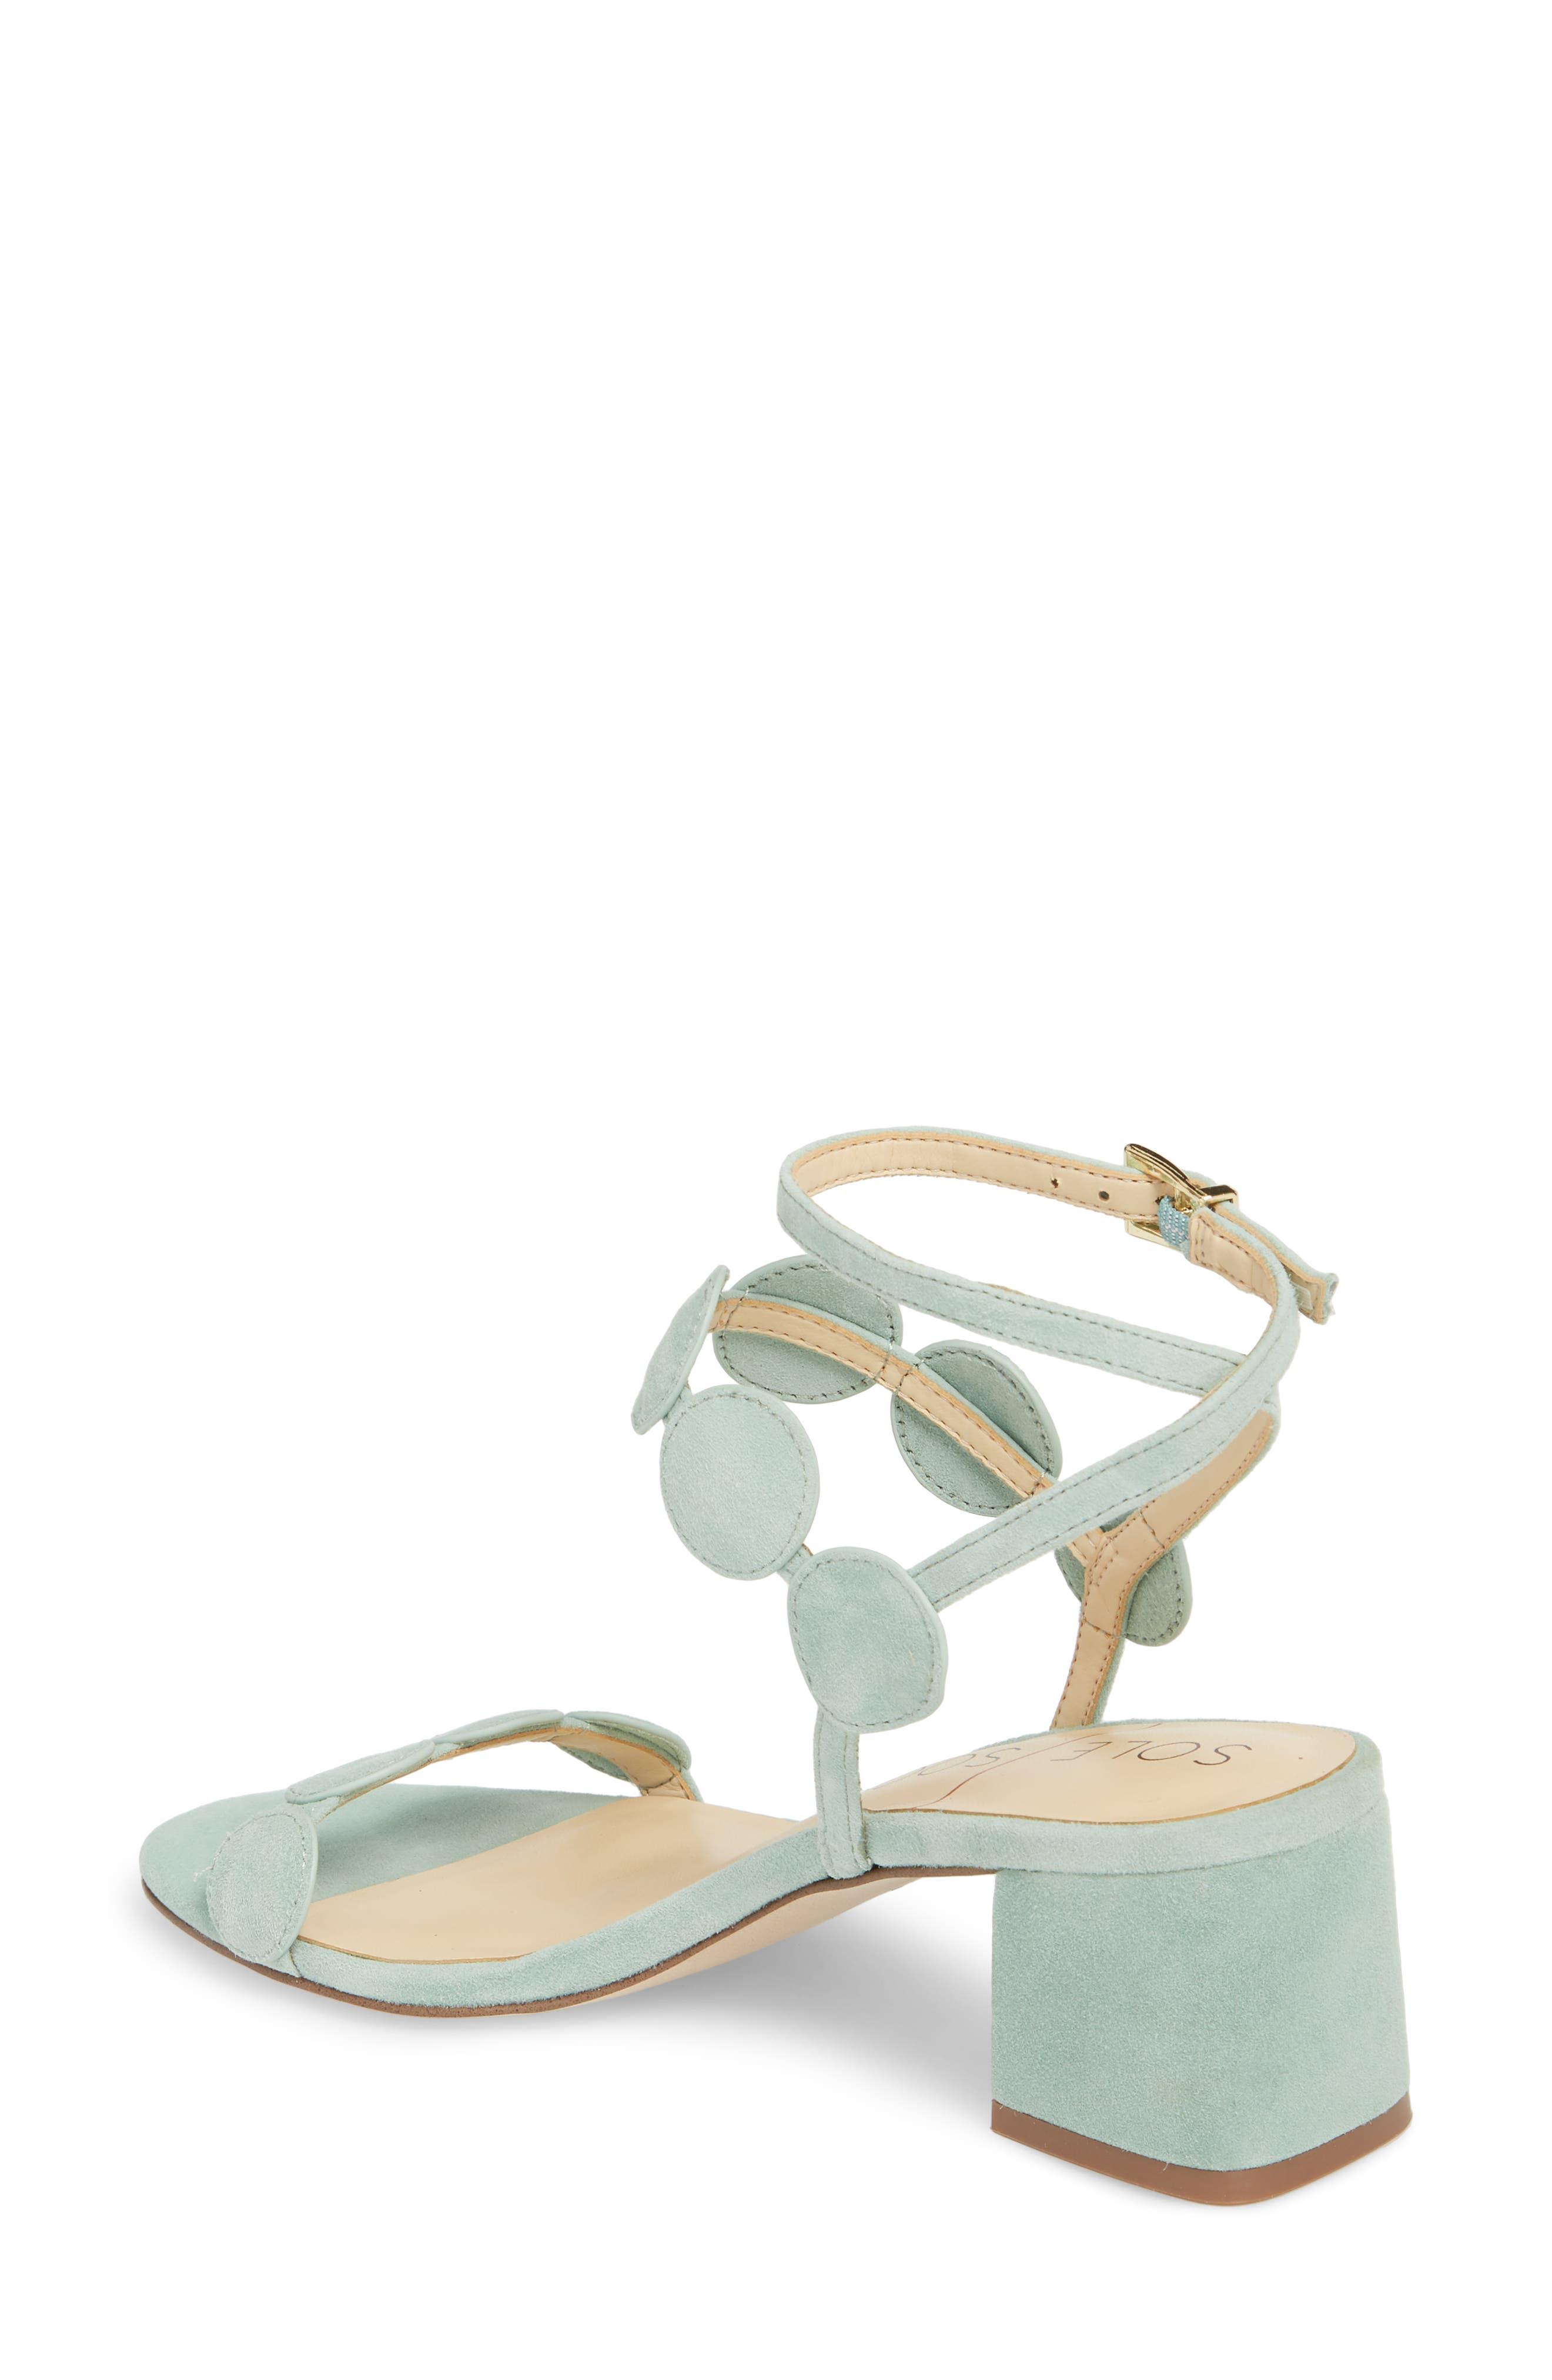 Shea Block Heel Sandal,                             Alternate thumbnail 9, color,